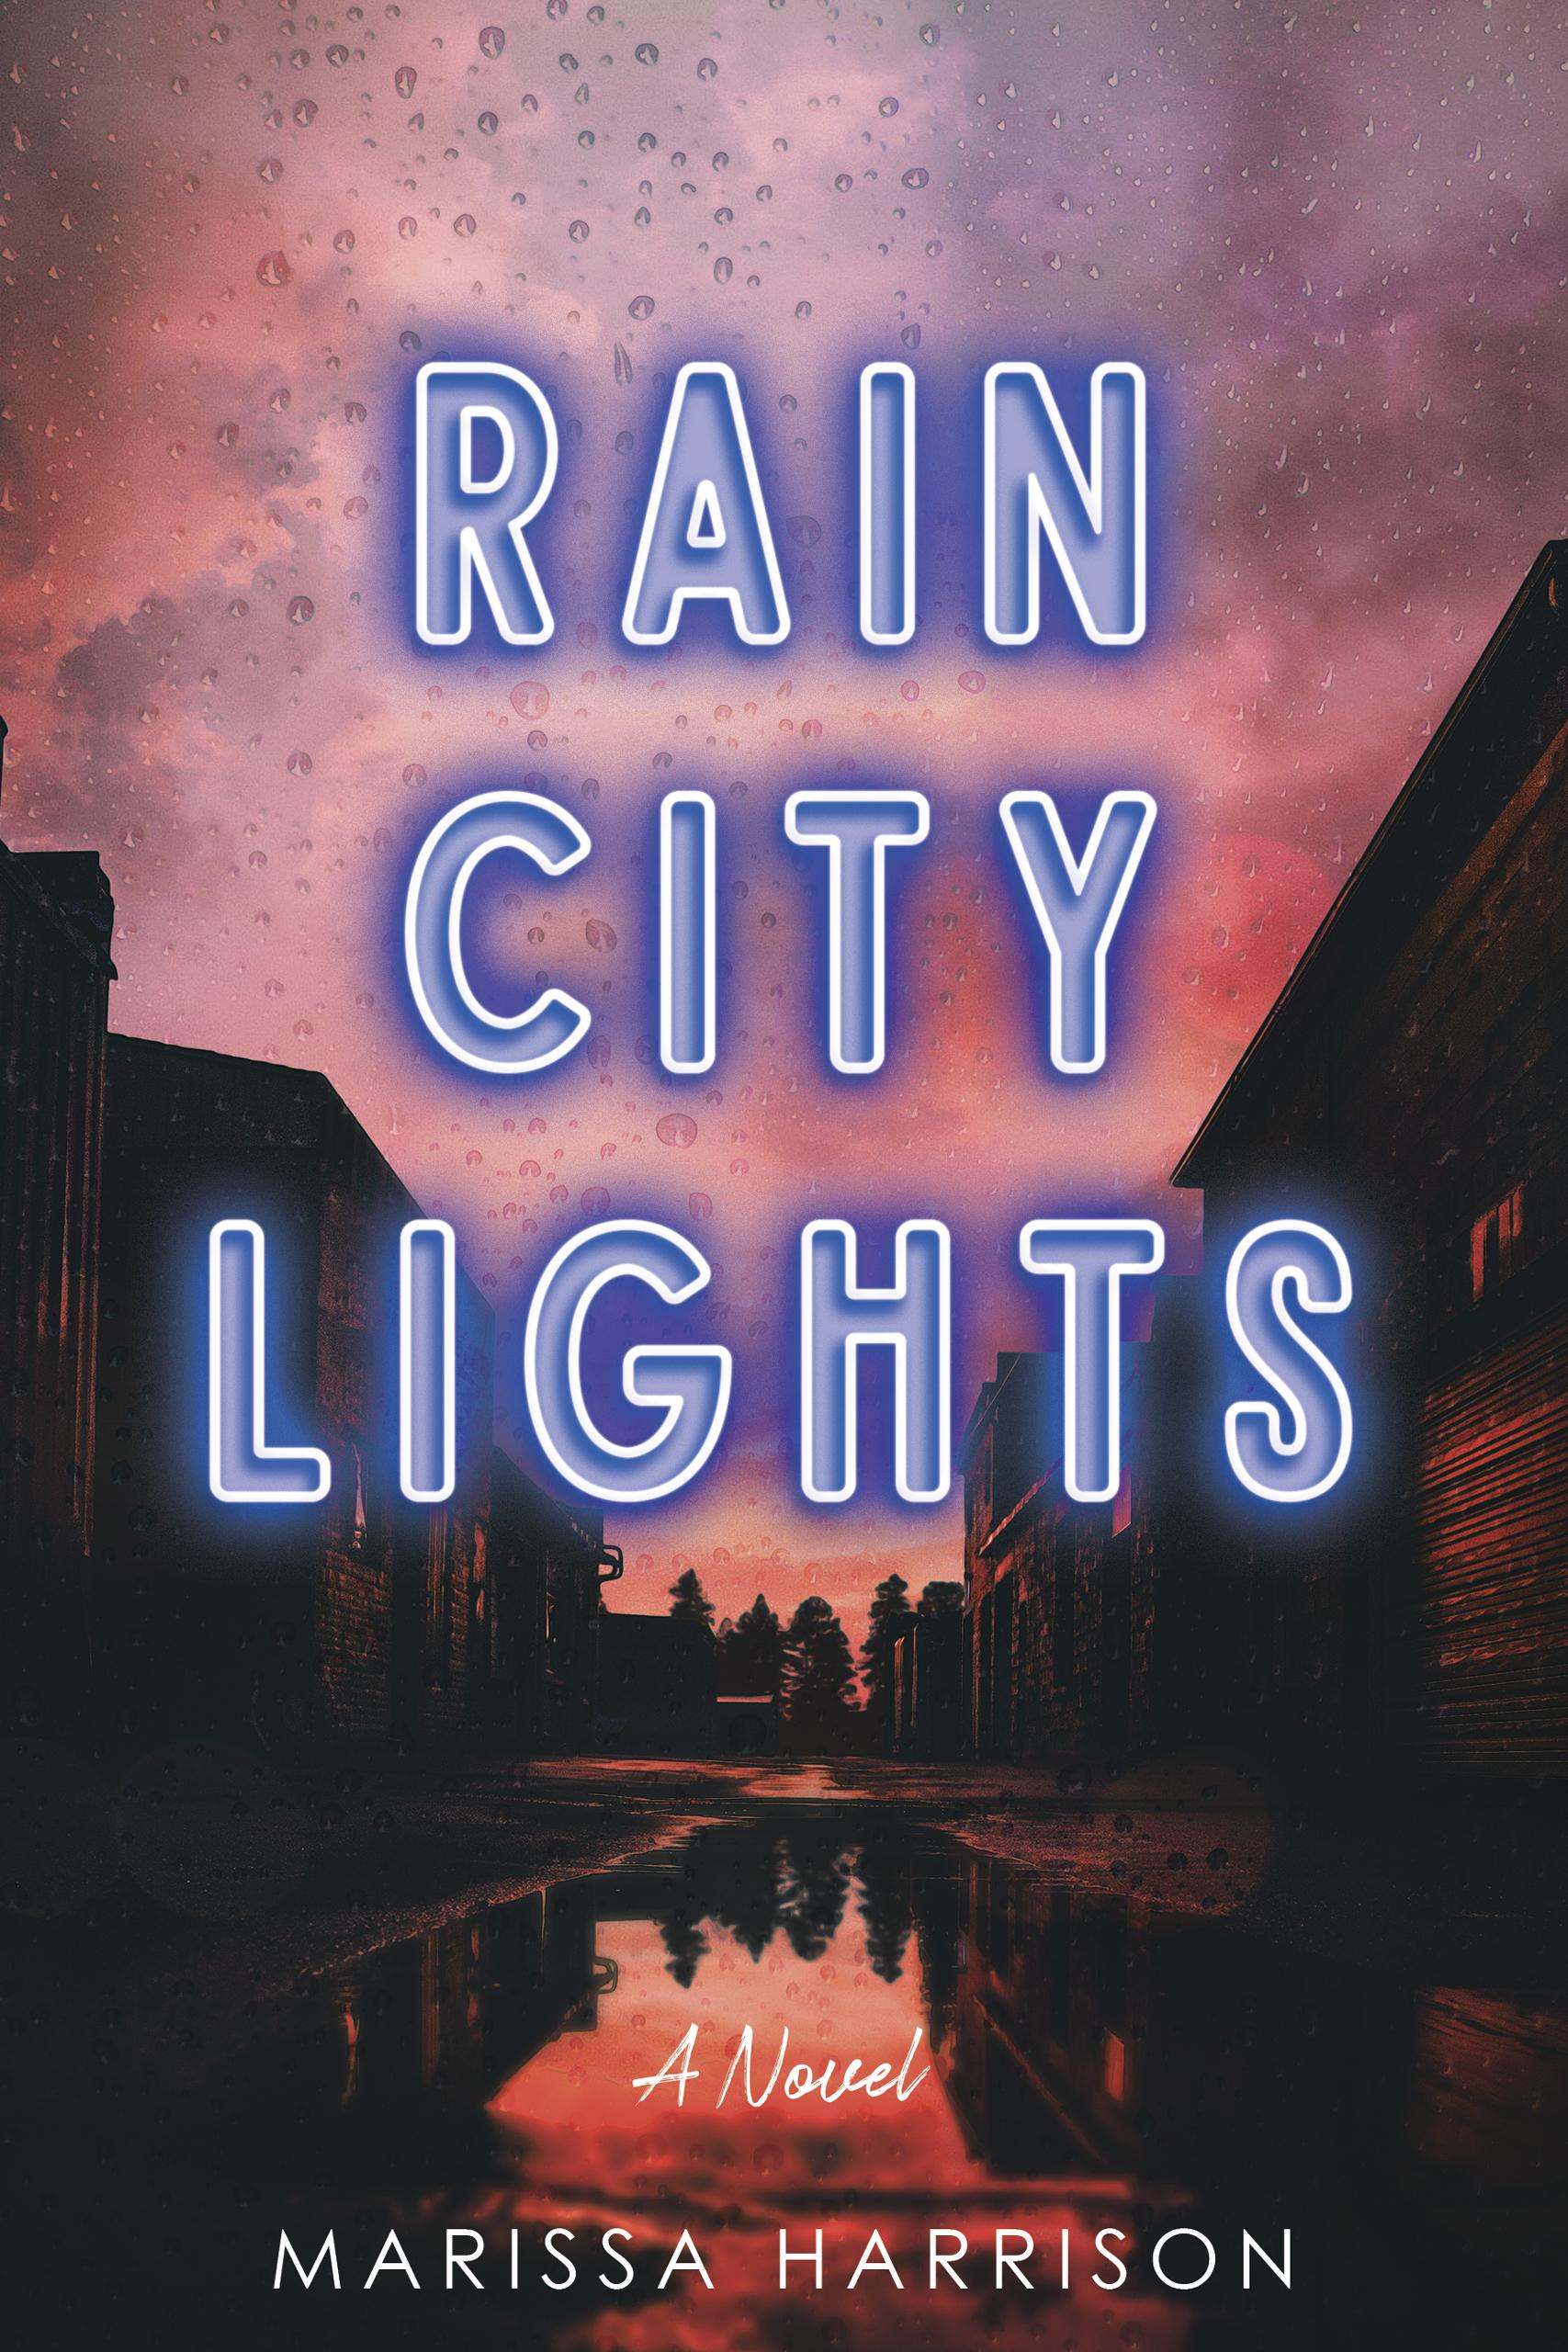 Rain-City-Lights-Cover Image